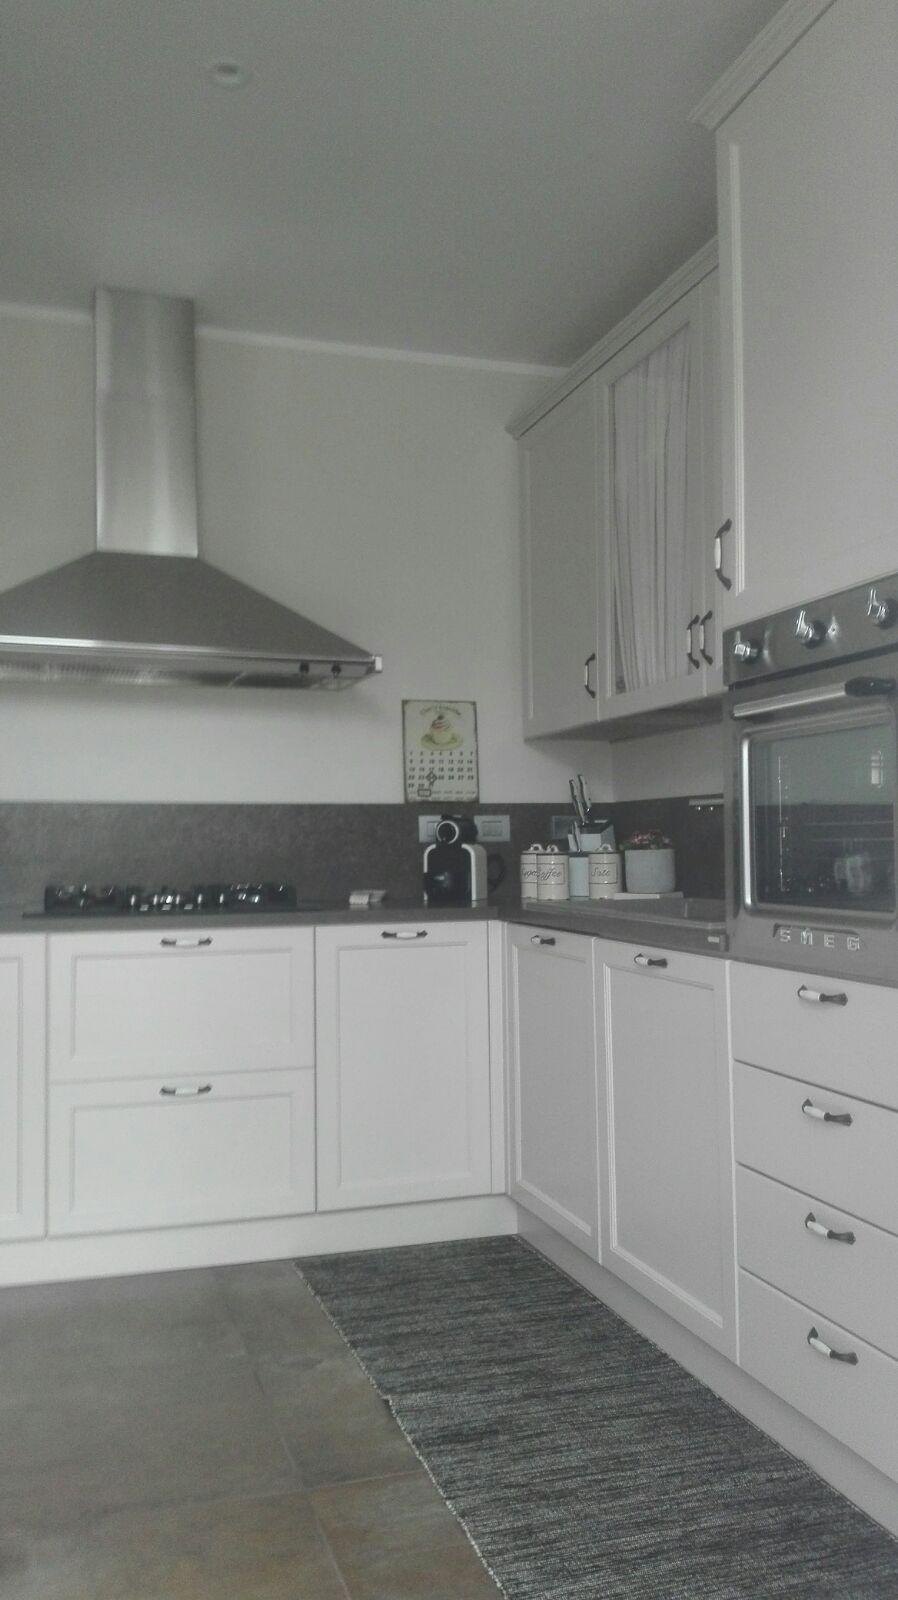 Cucine su misura genova falegnameria caselli - Cucine in muratura genova ...